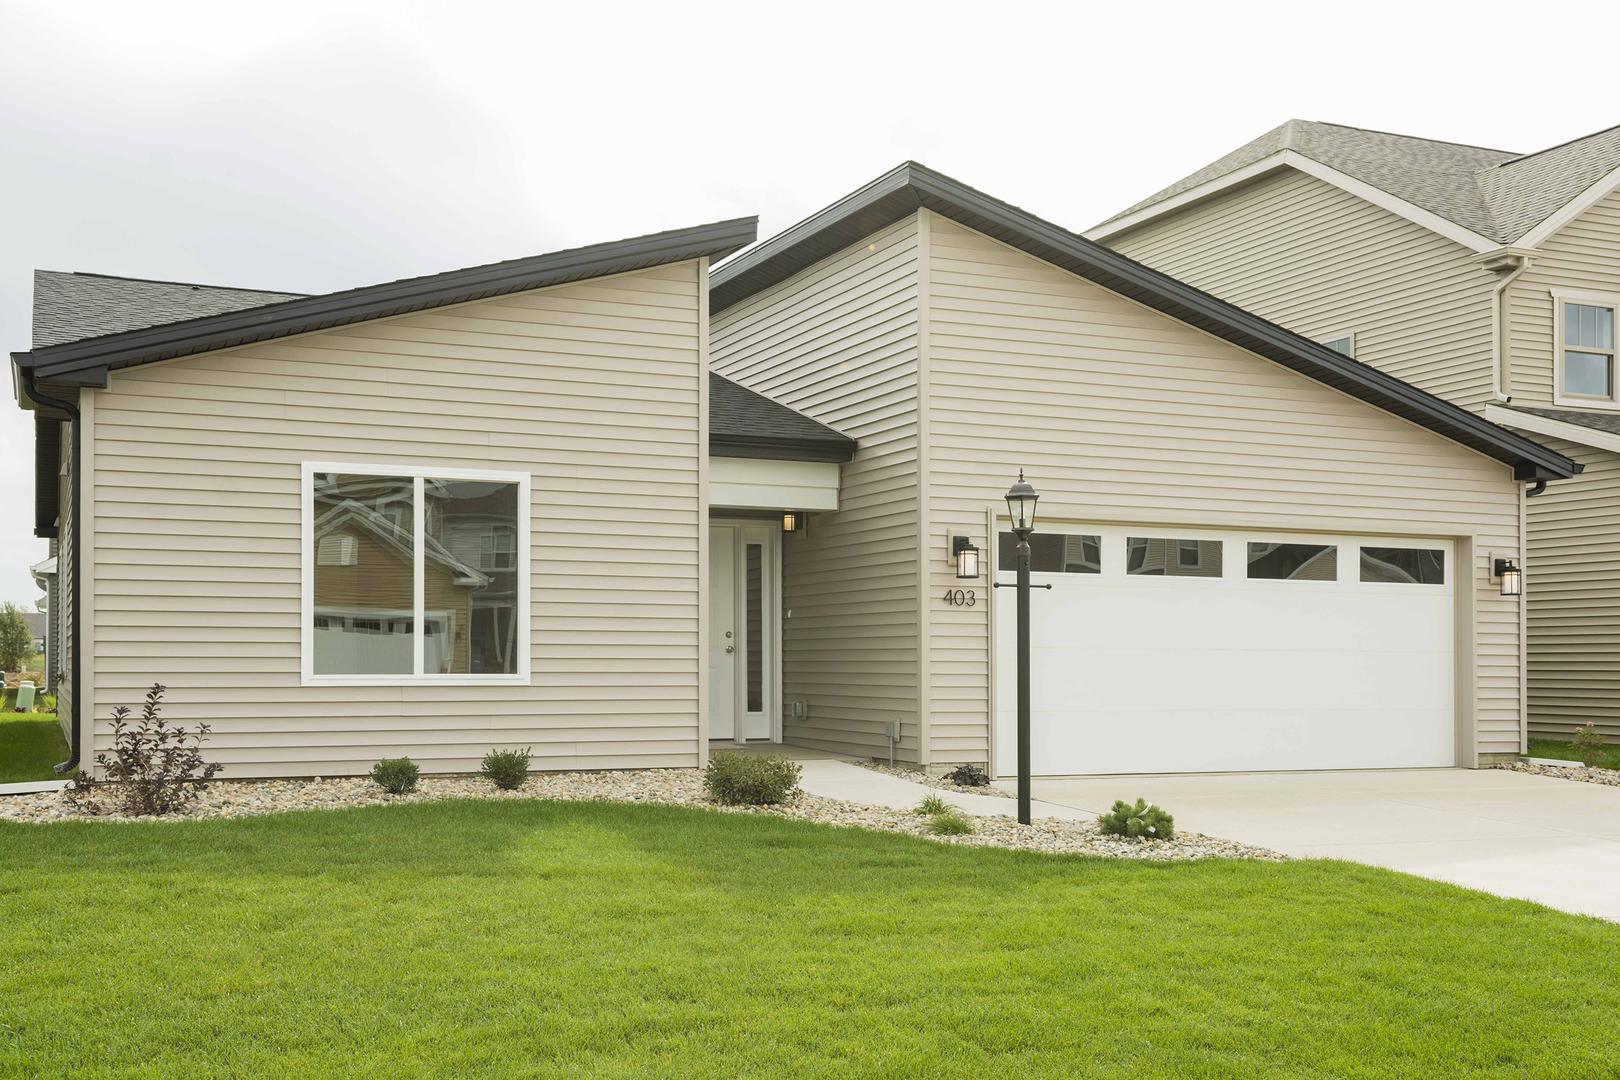 Photo of home for sale at 403 403 Corey Lane Lane, Champaign Il